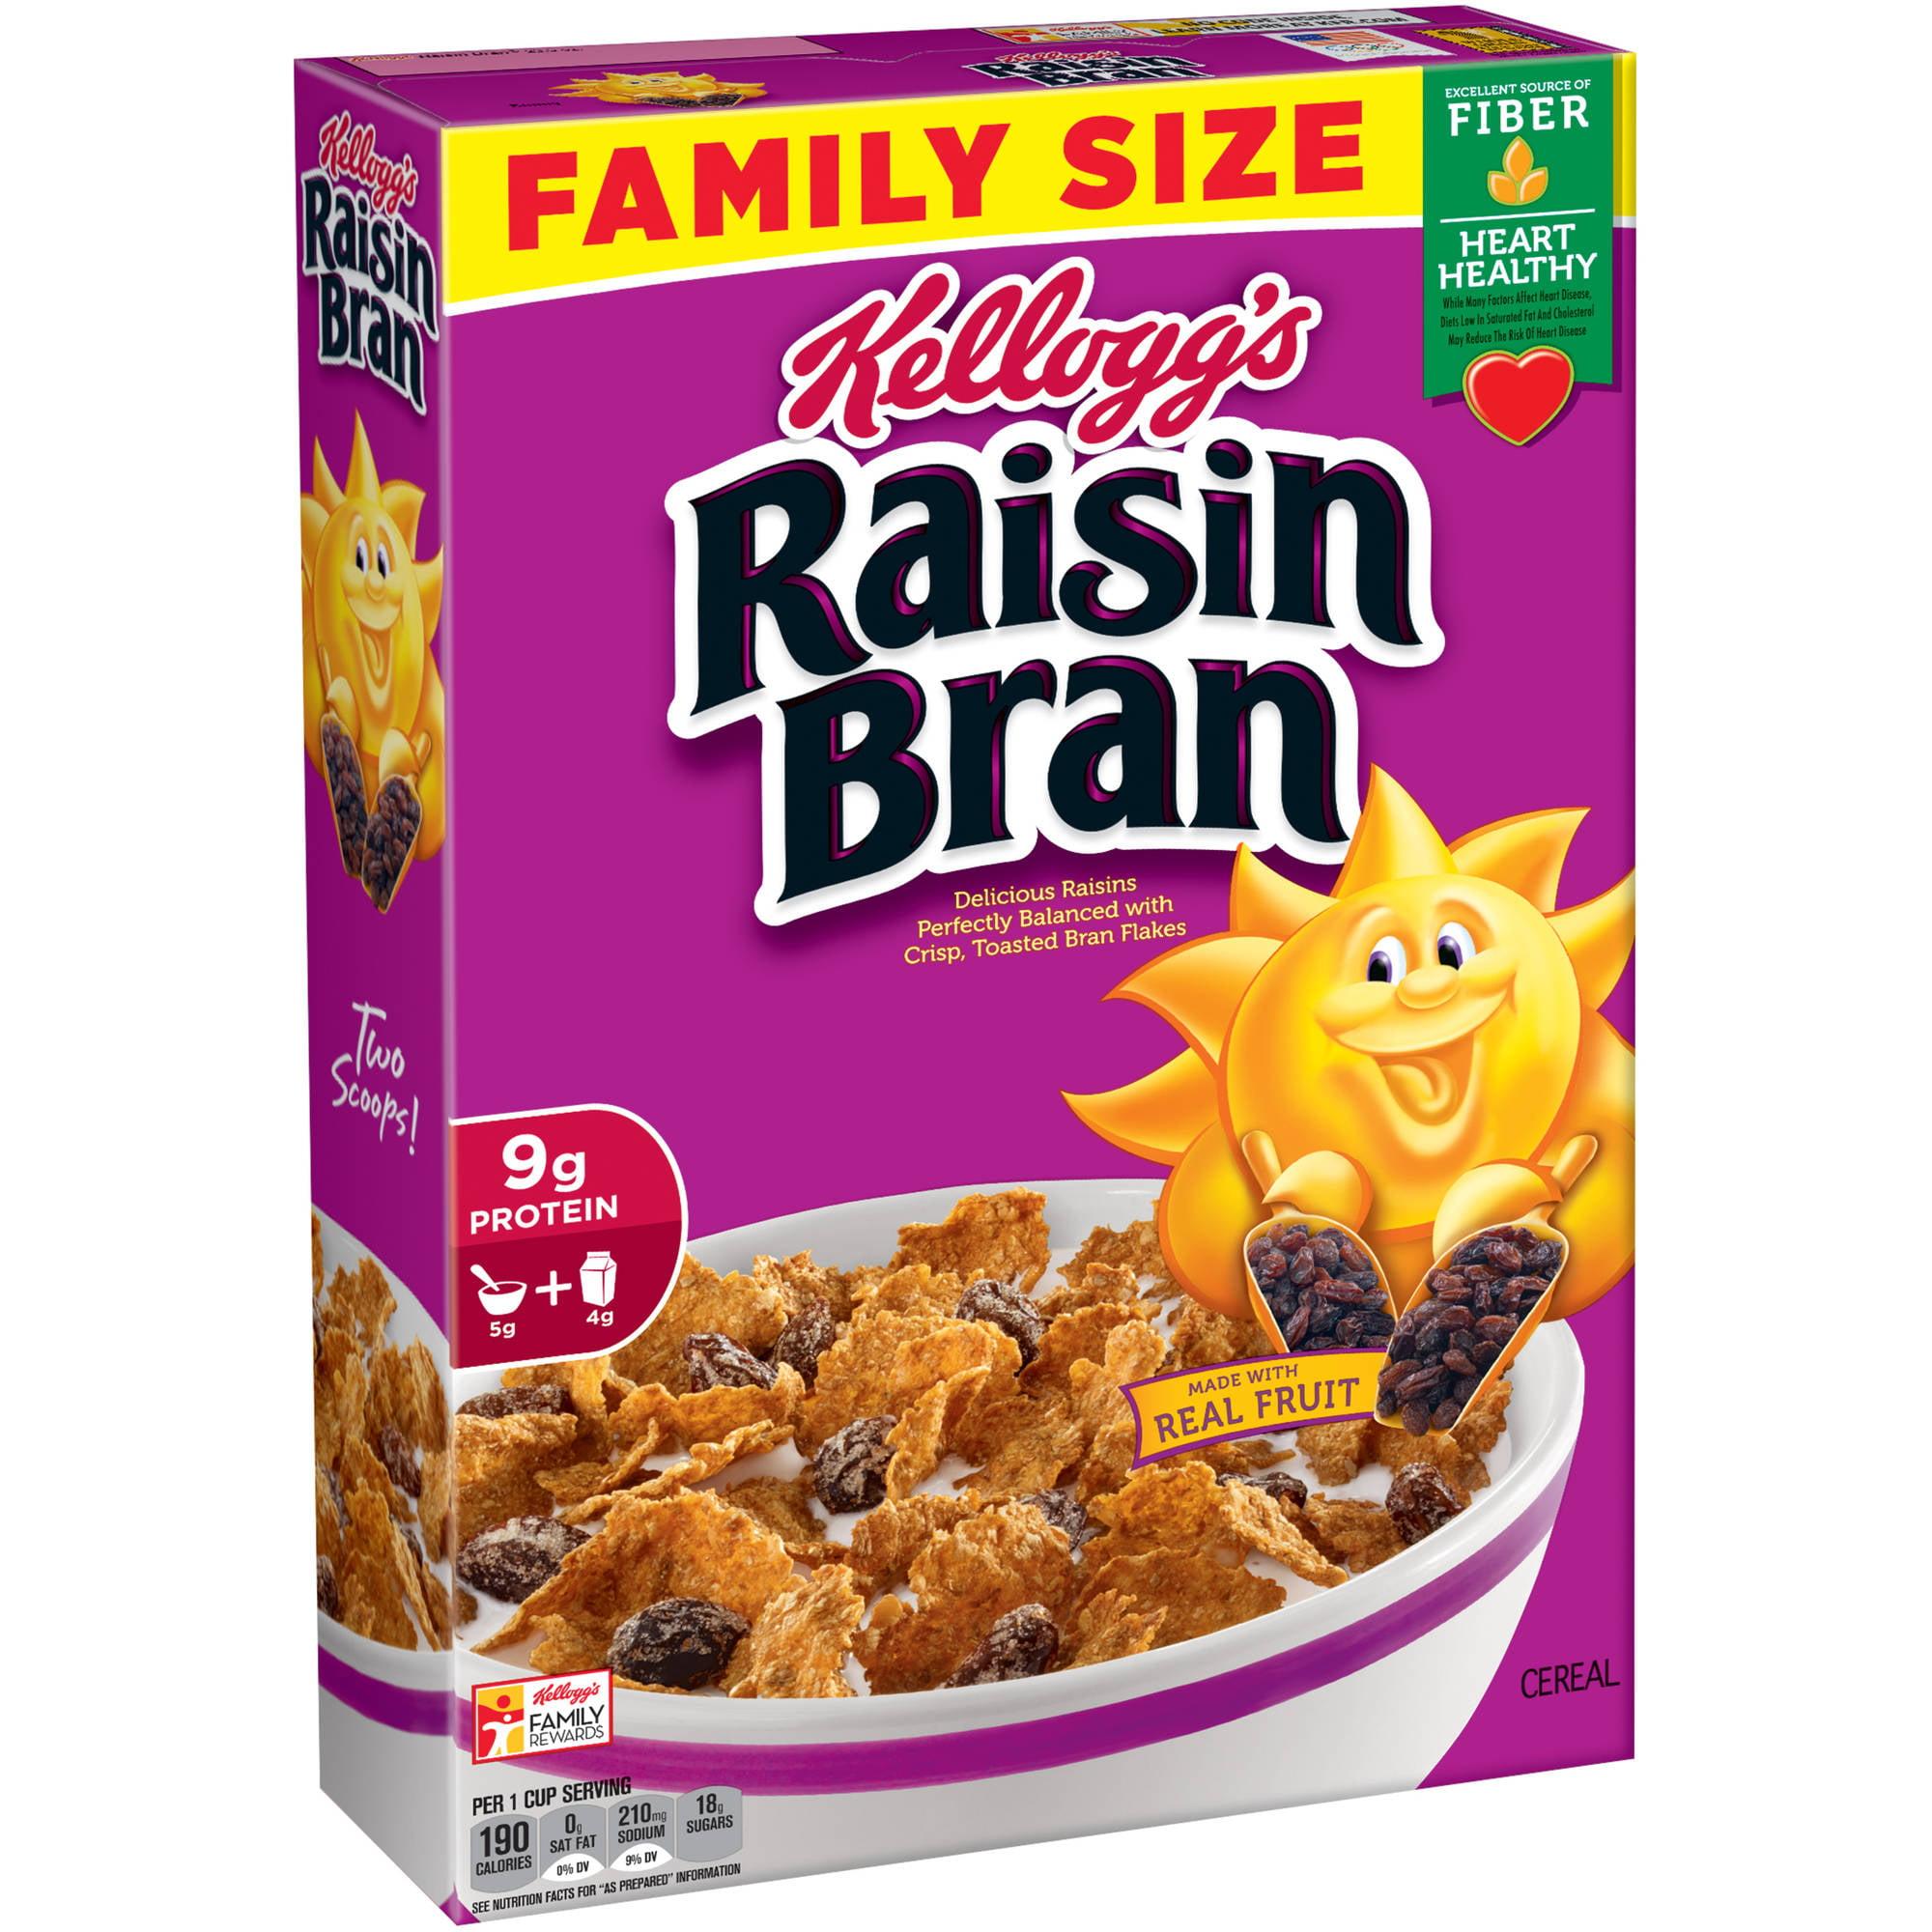 Kellogg's Raisin Bran Cereal, 23.5 oz